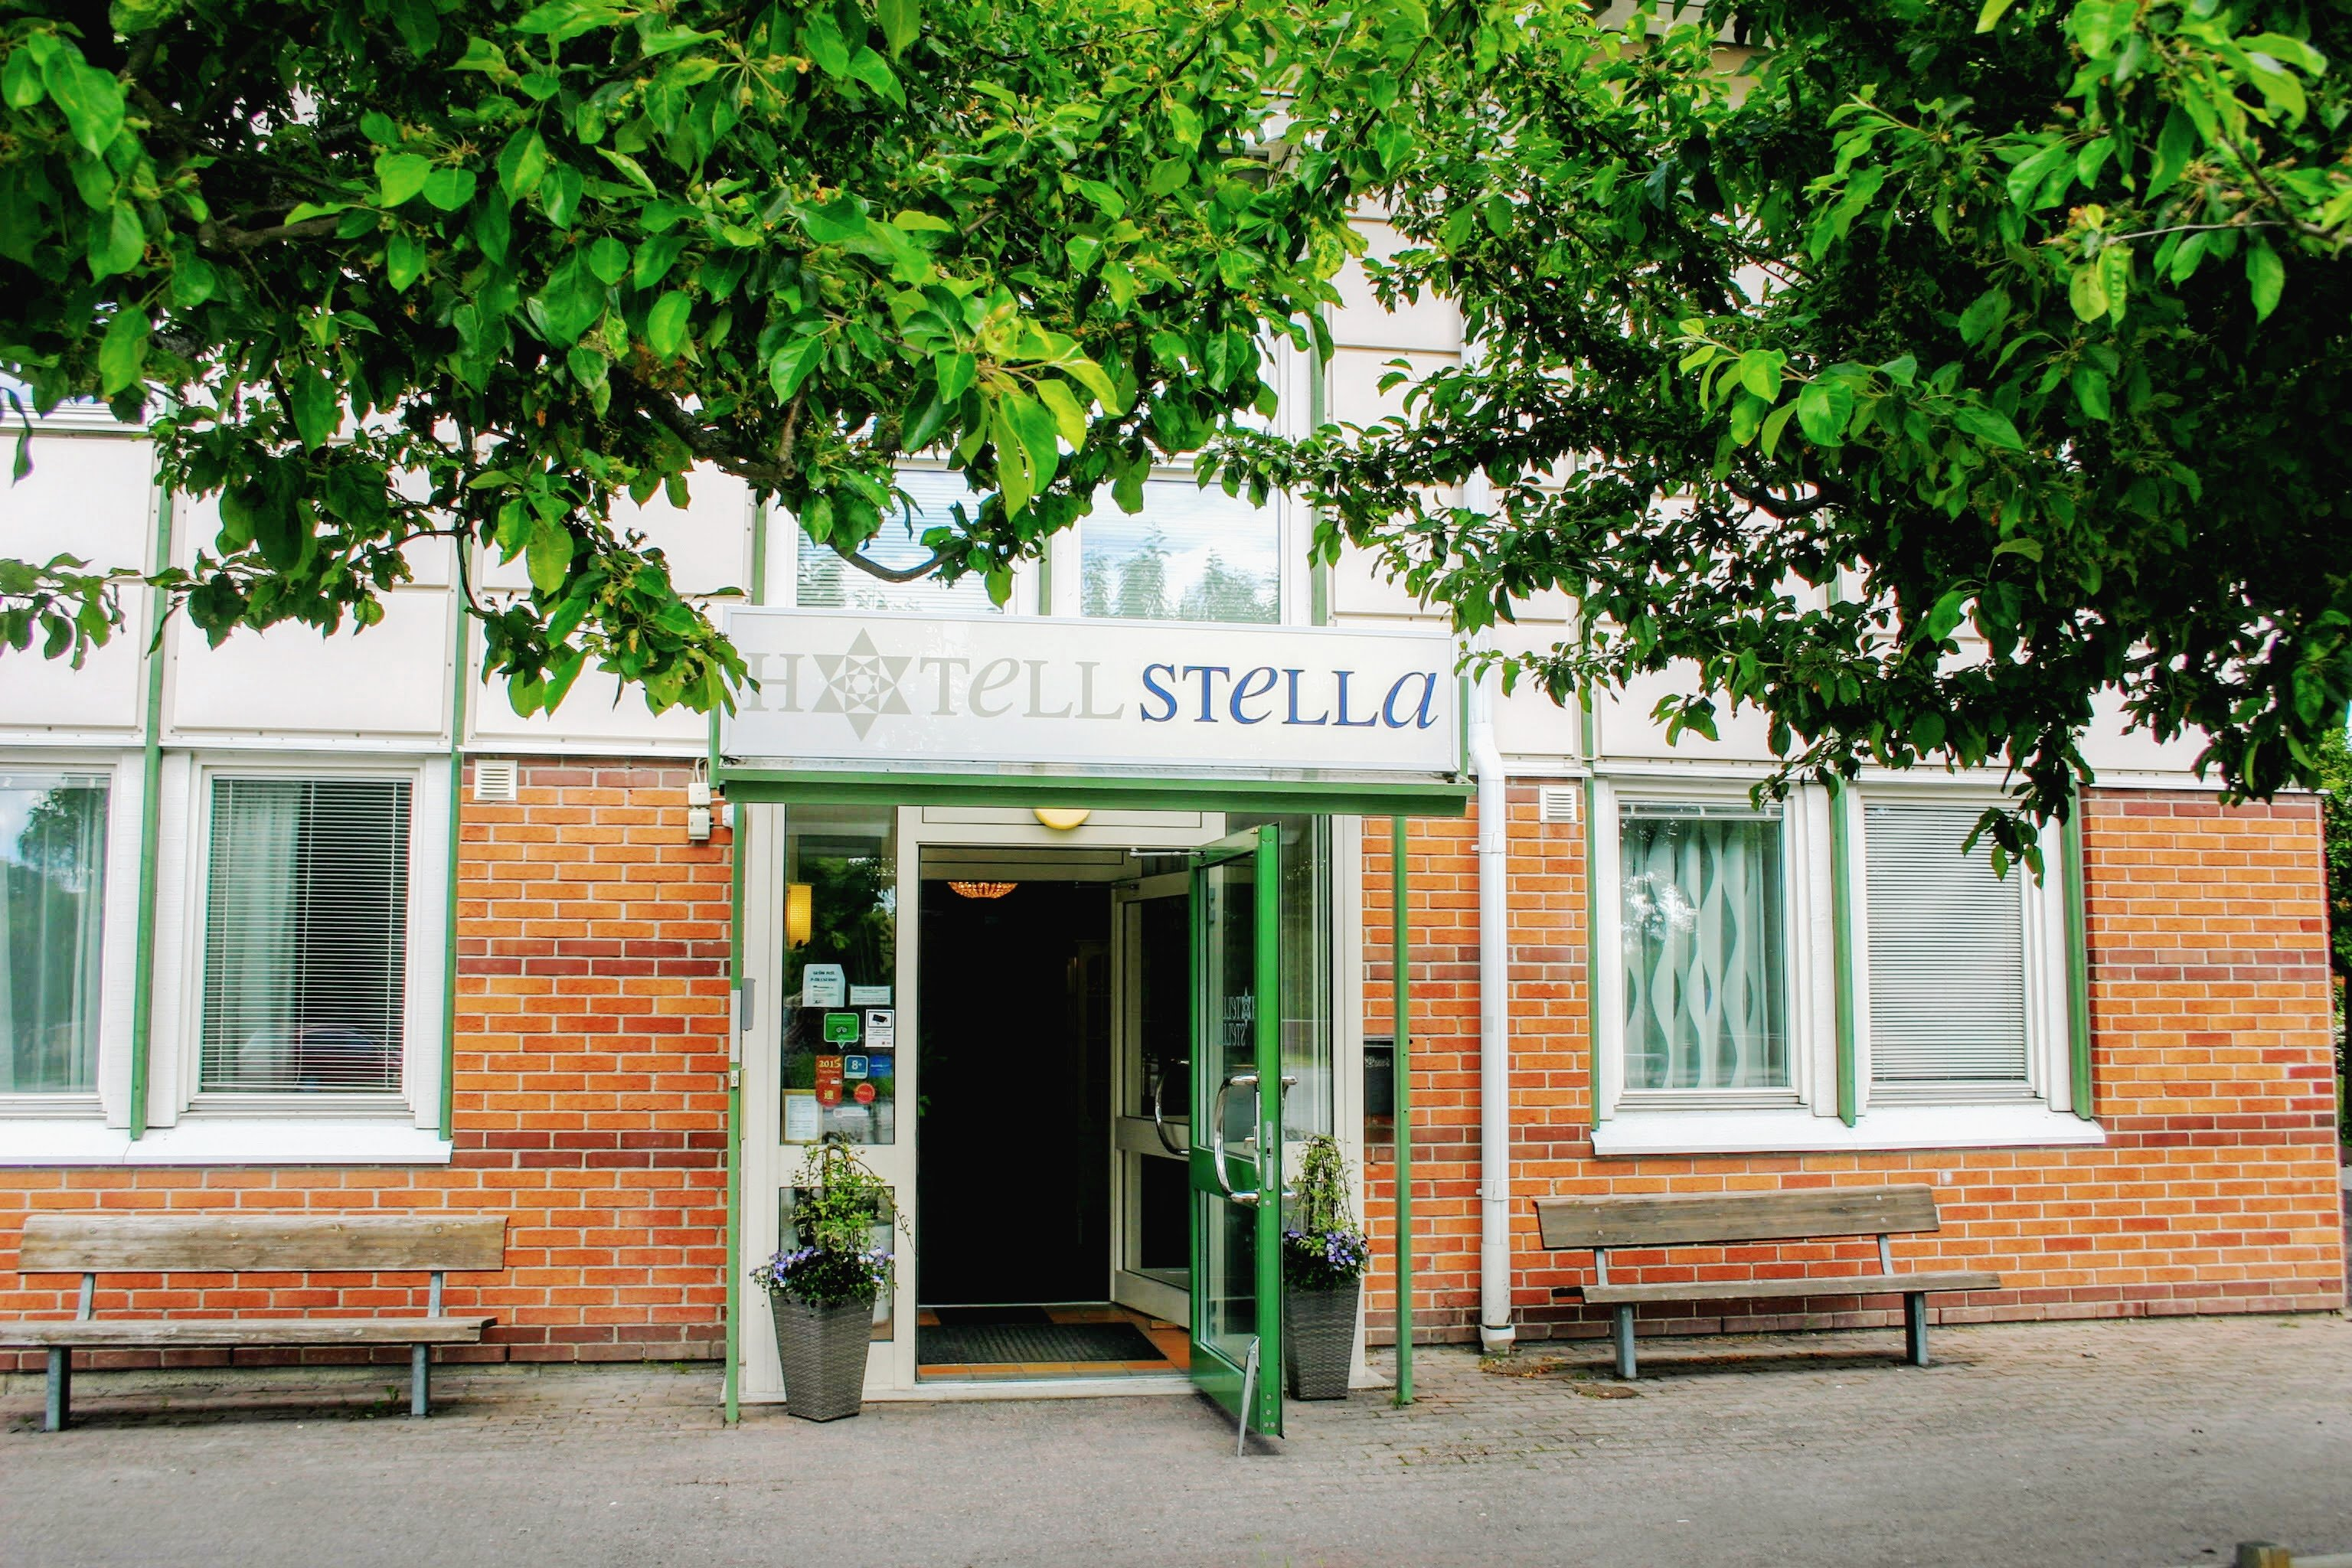 Hotell Stella